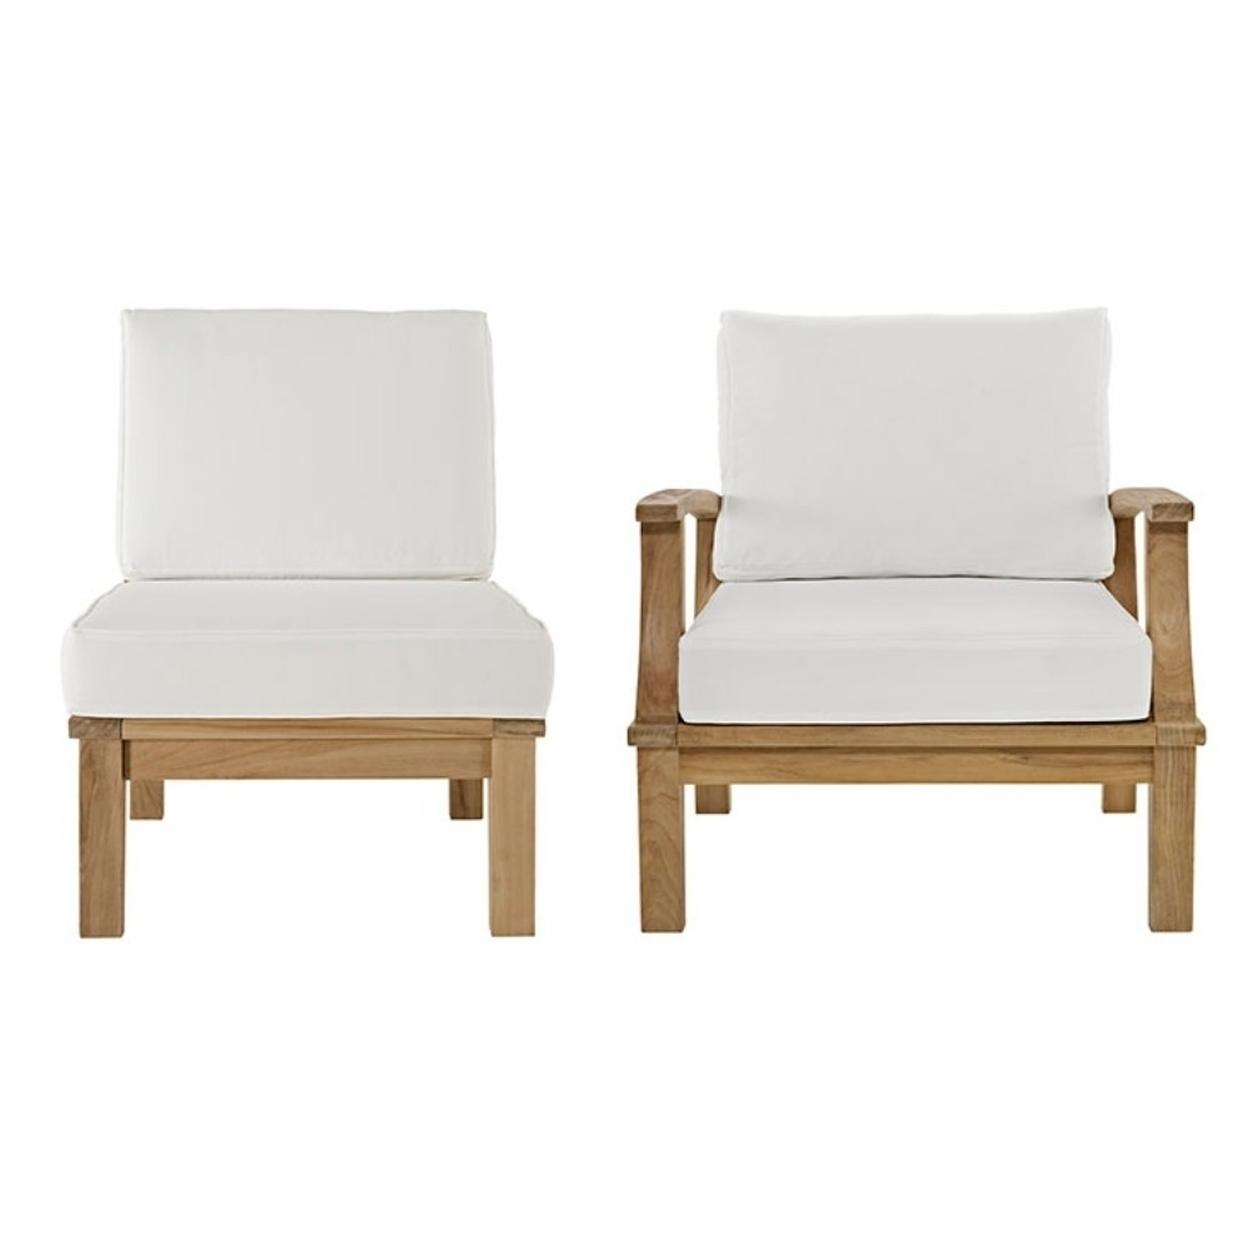 "Marina 2 Piece Outdoor Patio Teak Sofa Set, Natural White Size : 31.5\""Lx32.5\""Wx31.5\""H 59a7a0702a00e45d3605aa86"